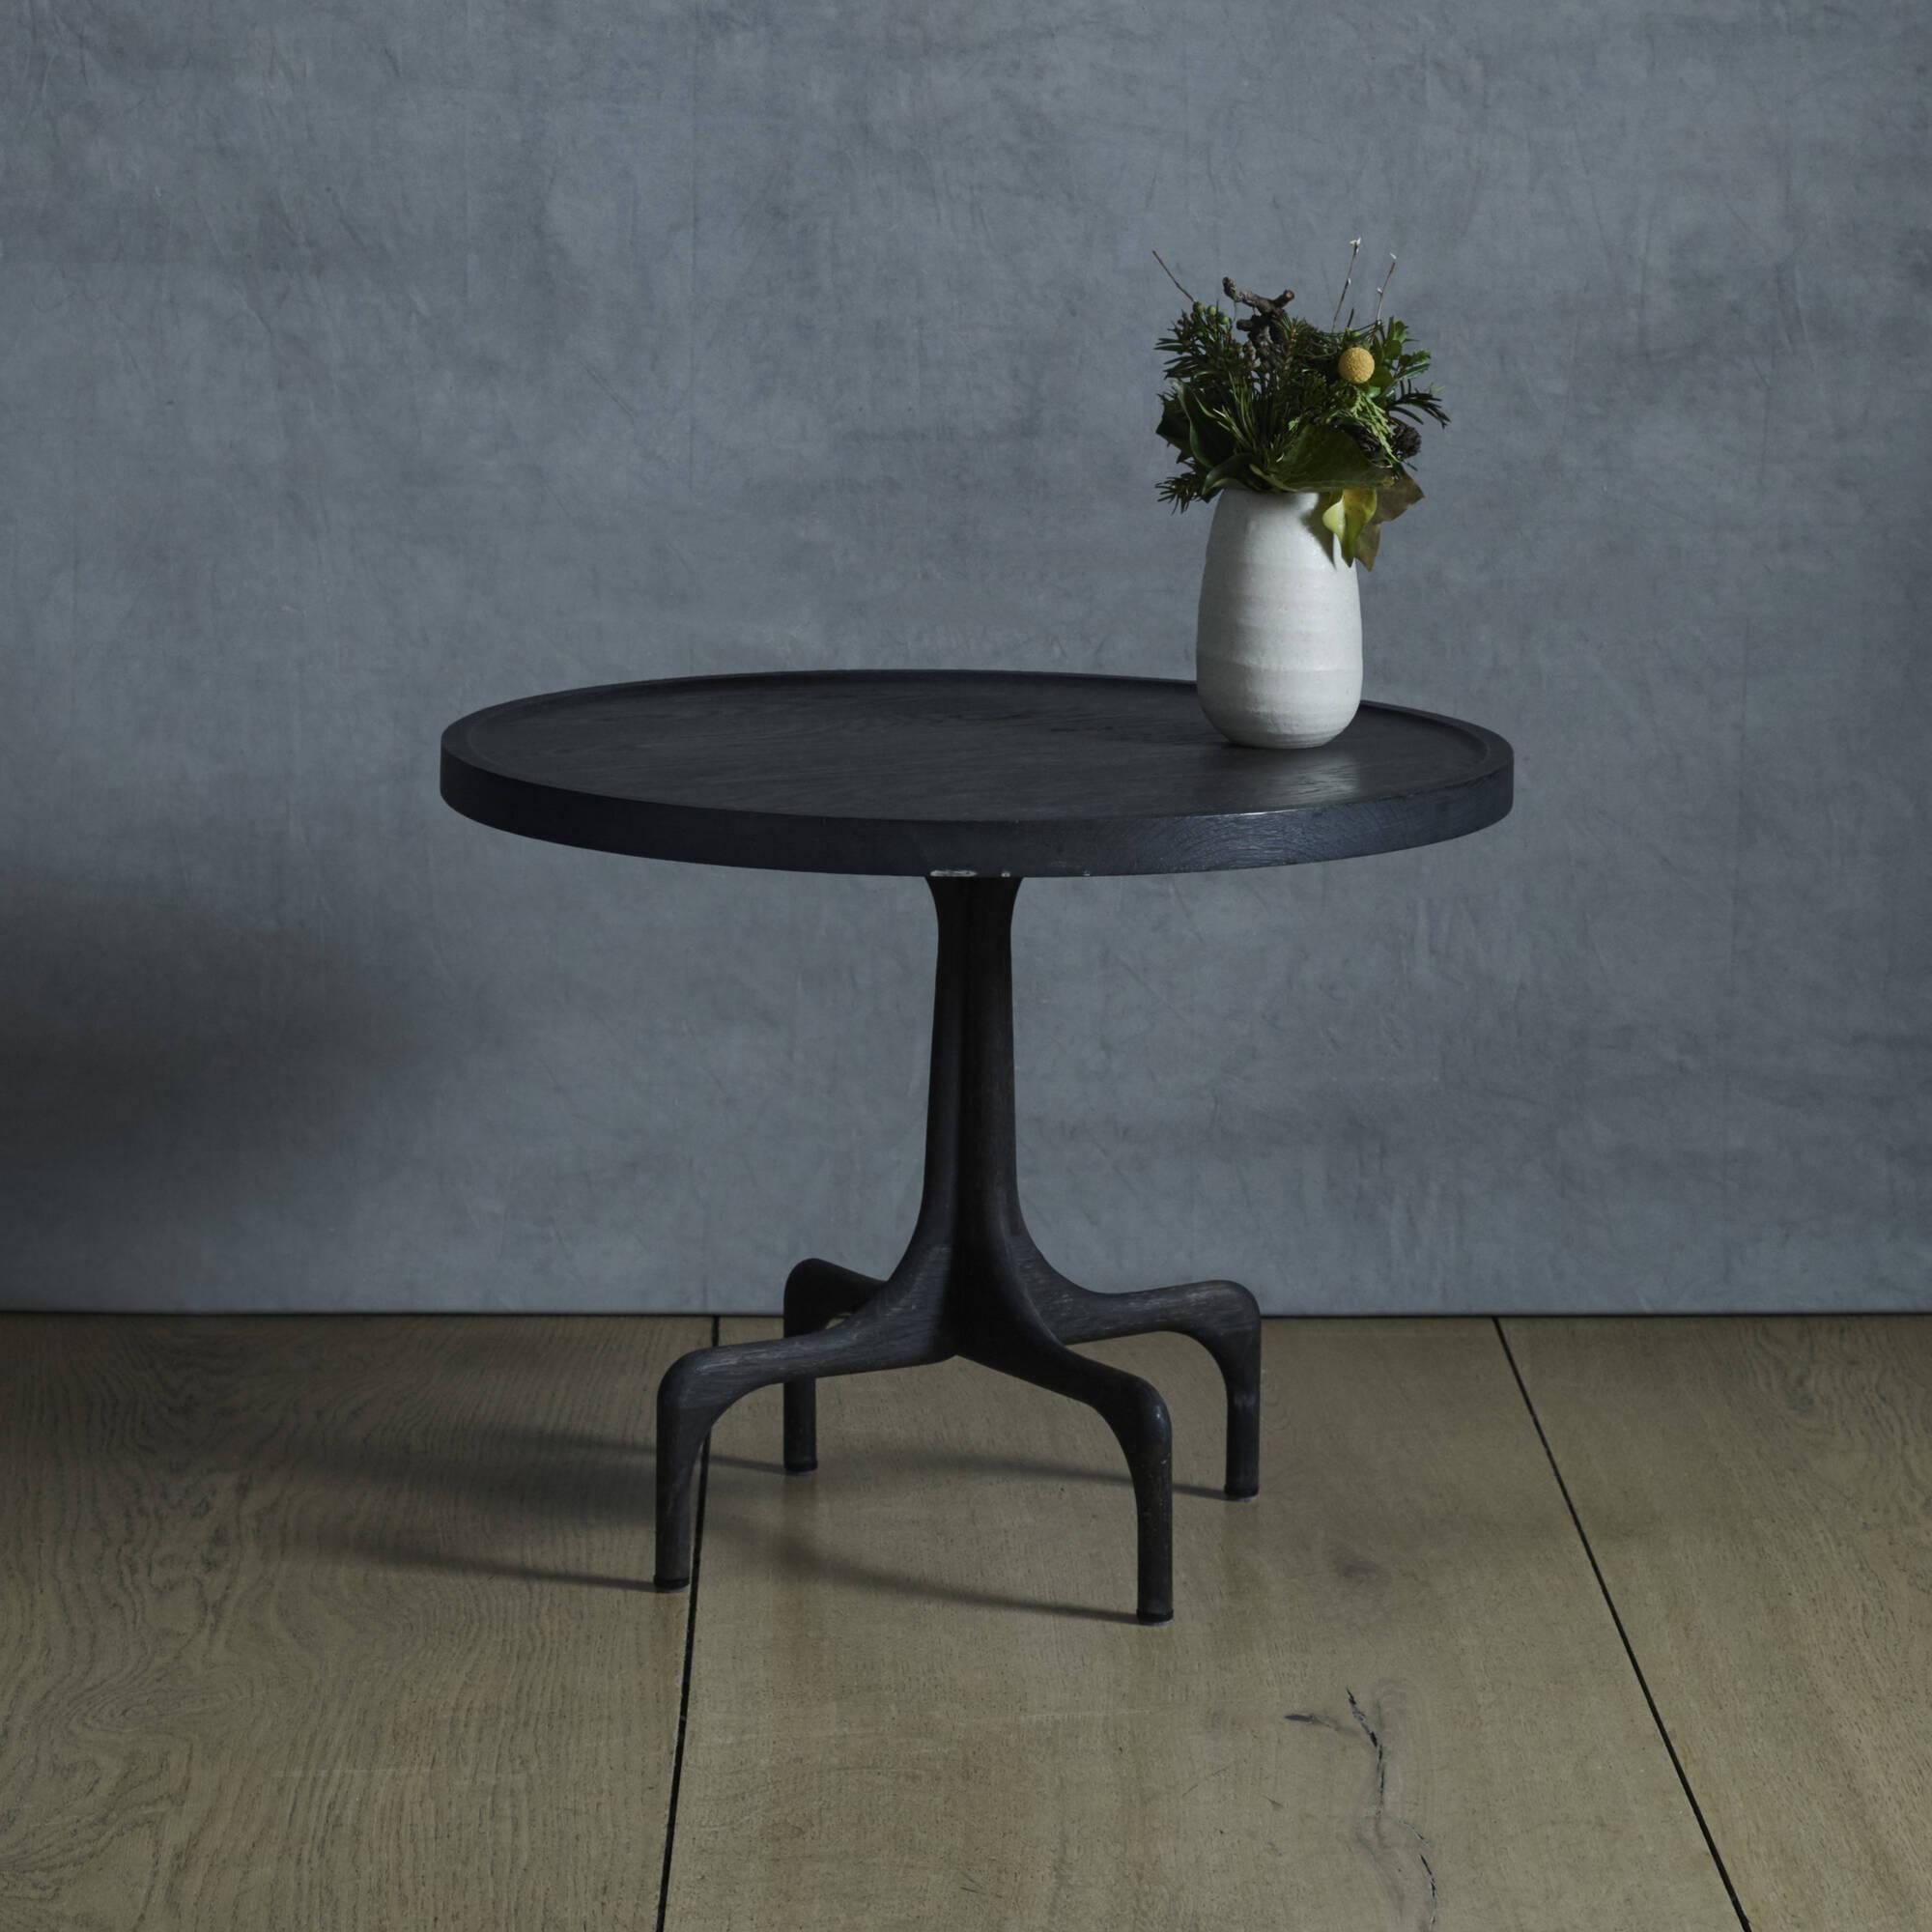 254 SPACE Copenhagen custom coffee table noma 2 November